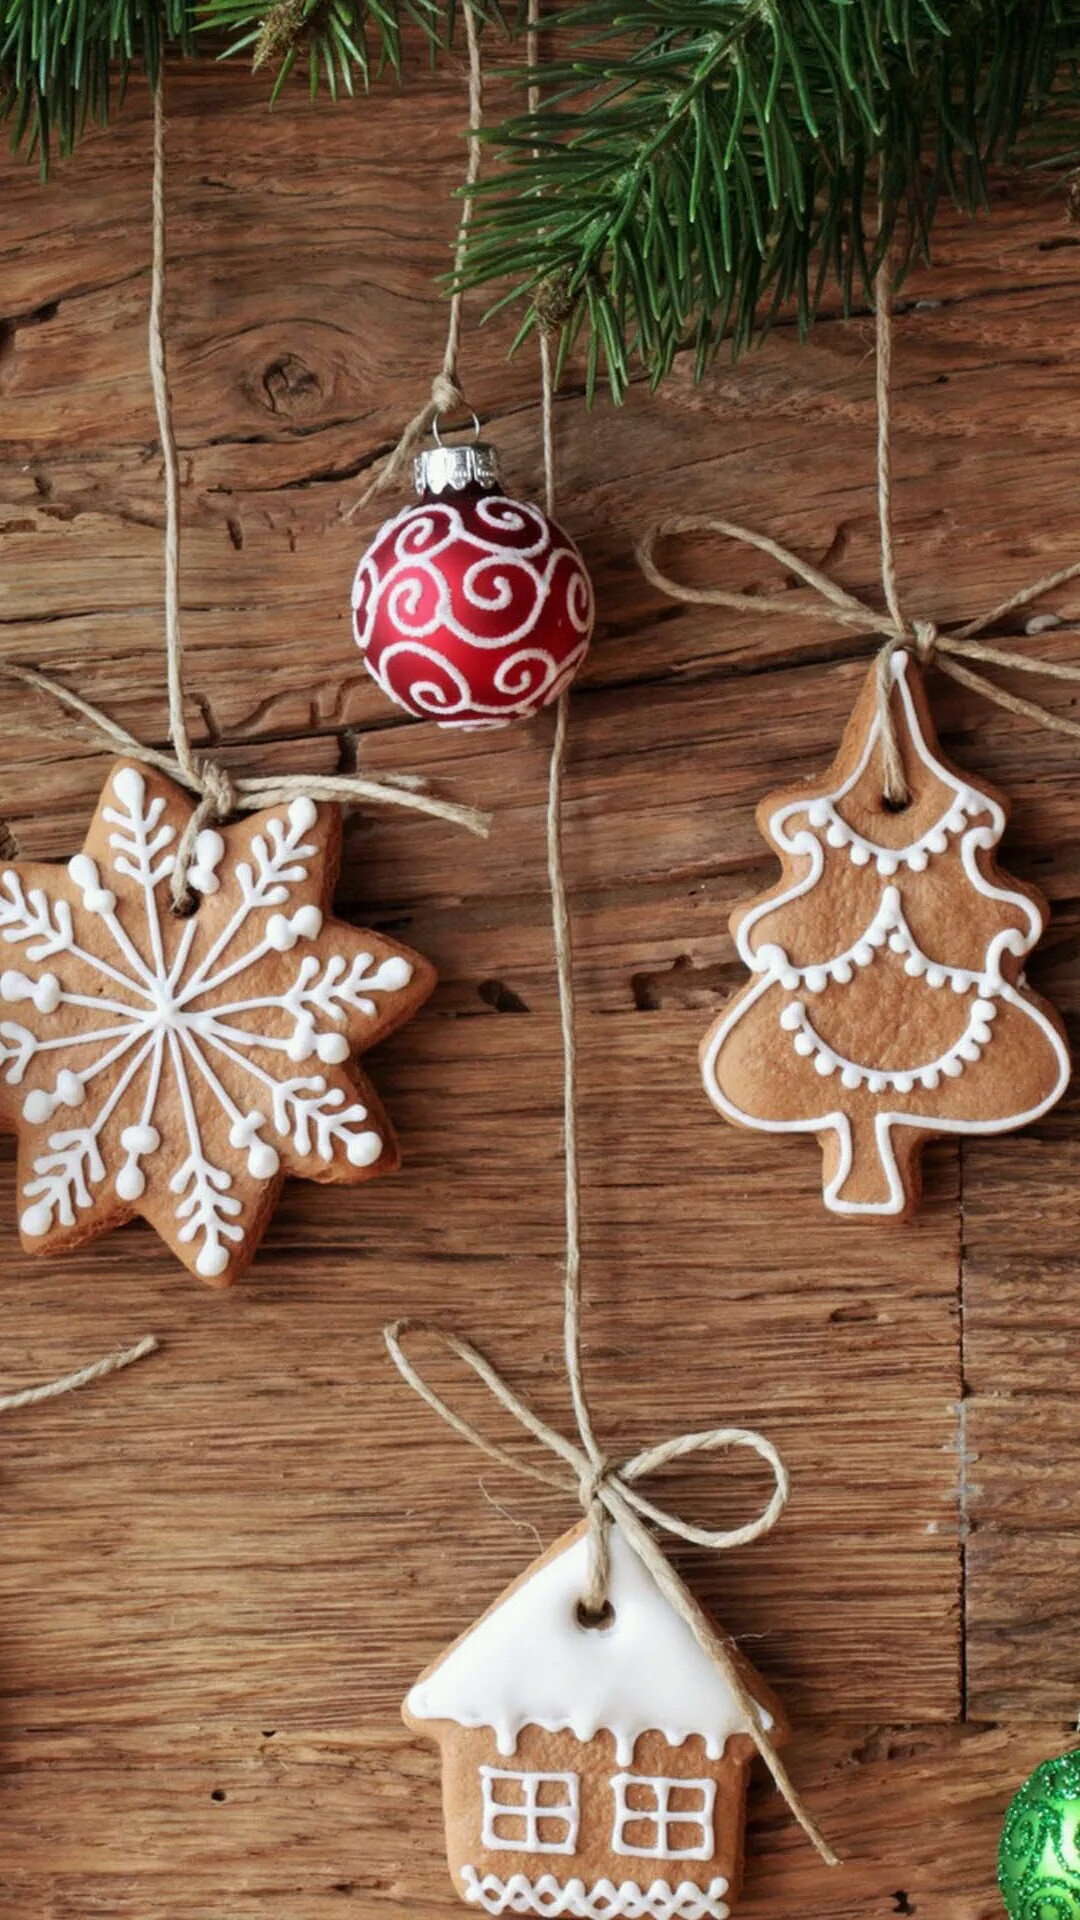 Christmas Cookies Wallpaper  Download Christmas cookies ornaments 1080 x 1920